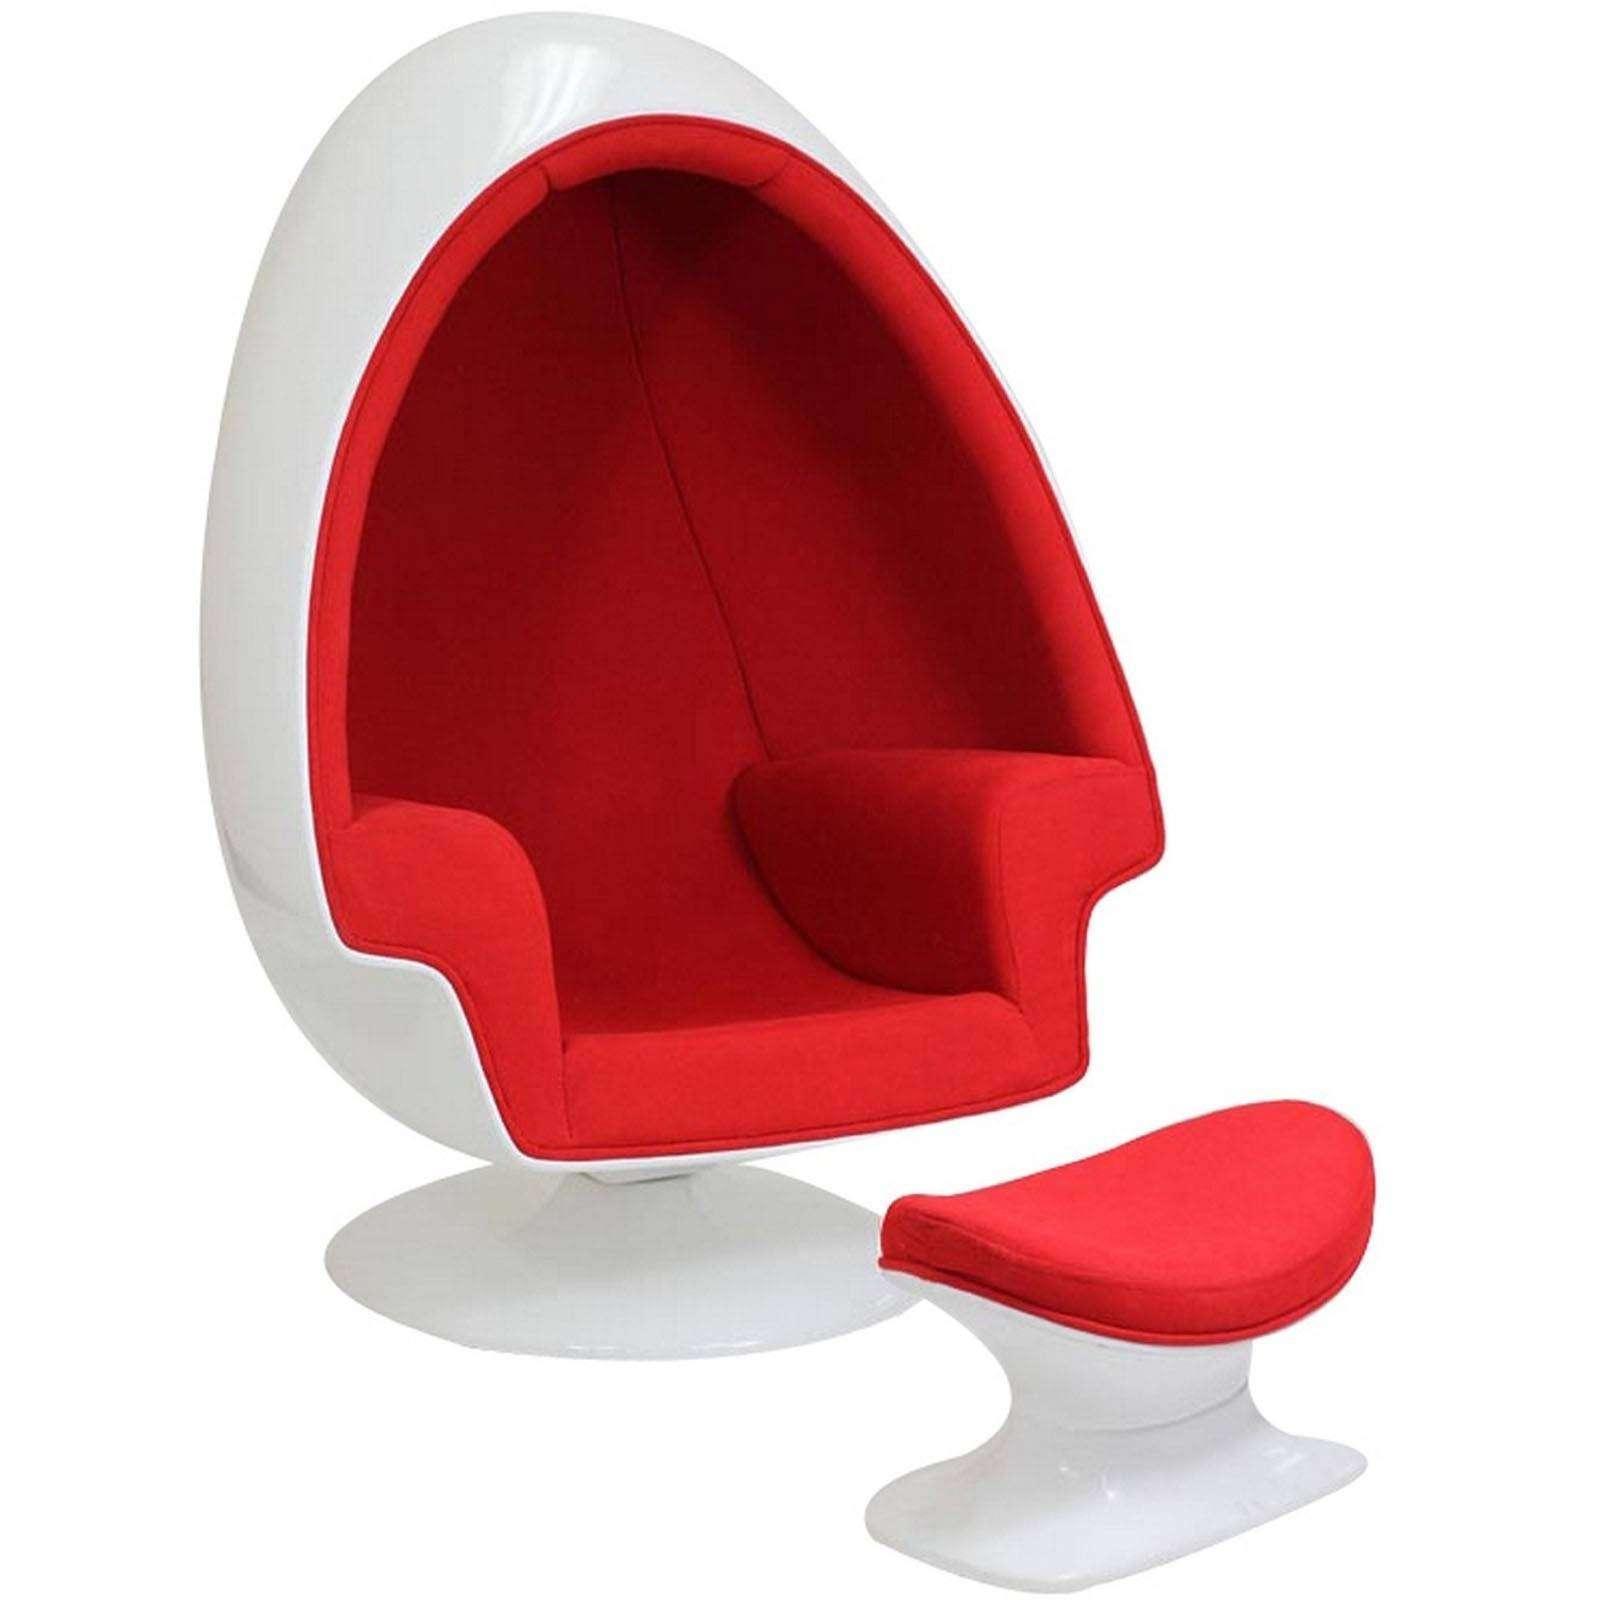 fiberglass shell chair fishing lawn eero aarnio alpha egg & ottoman